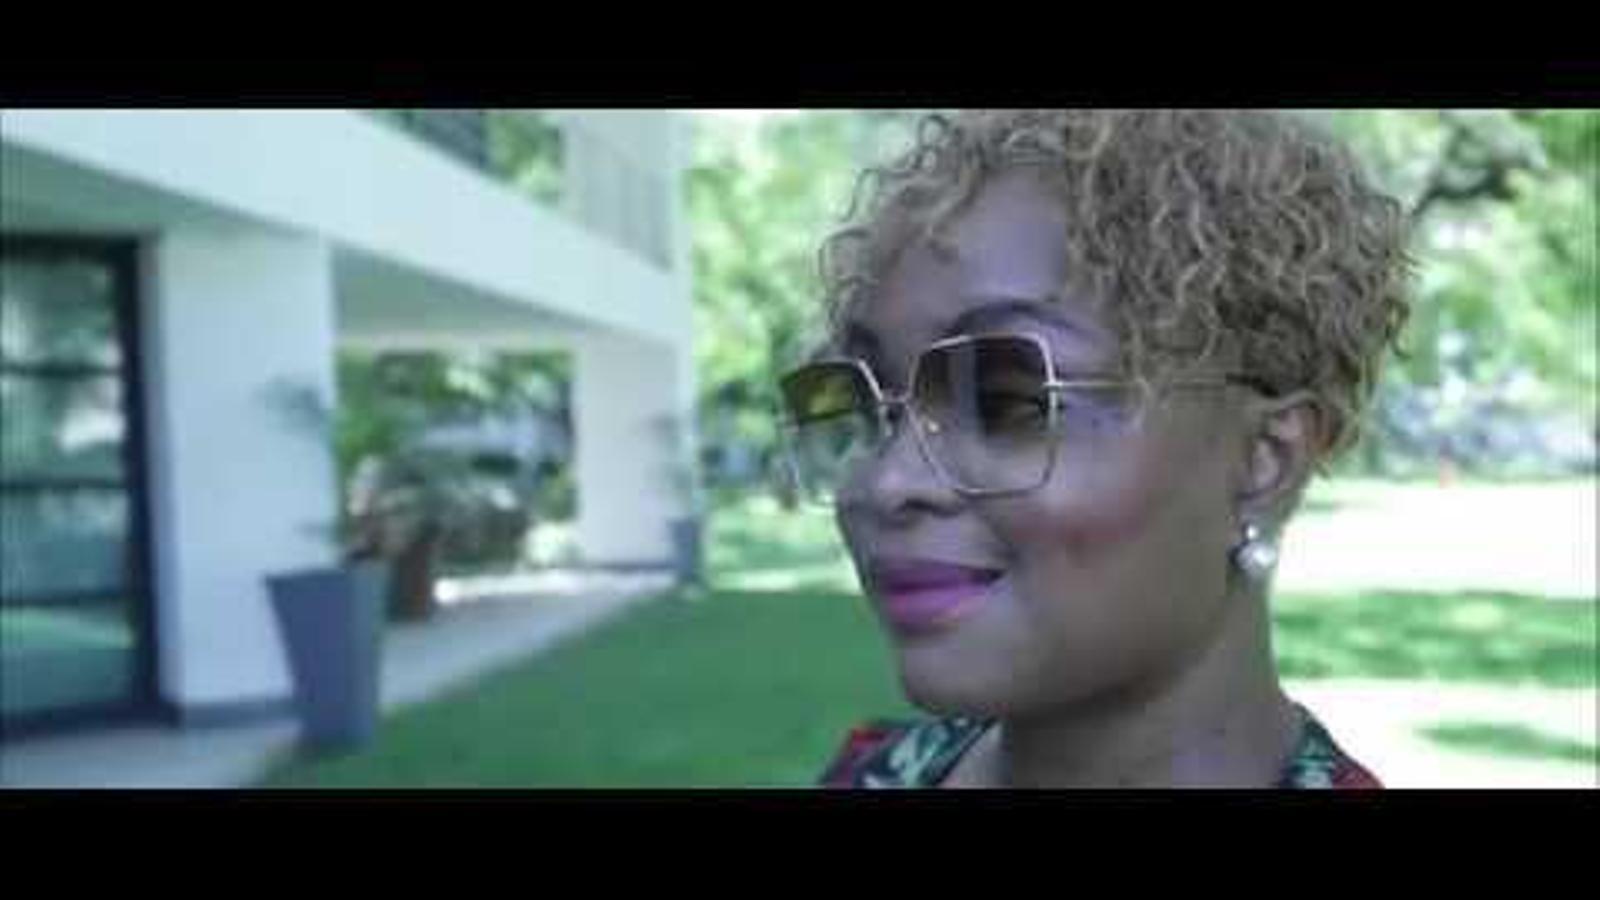 VÍDEO DOCUMENTAL WOMAN DE MEDICUS MUNDI